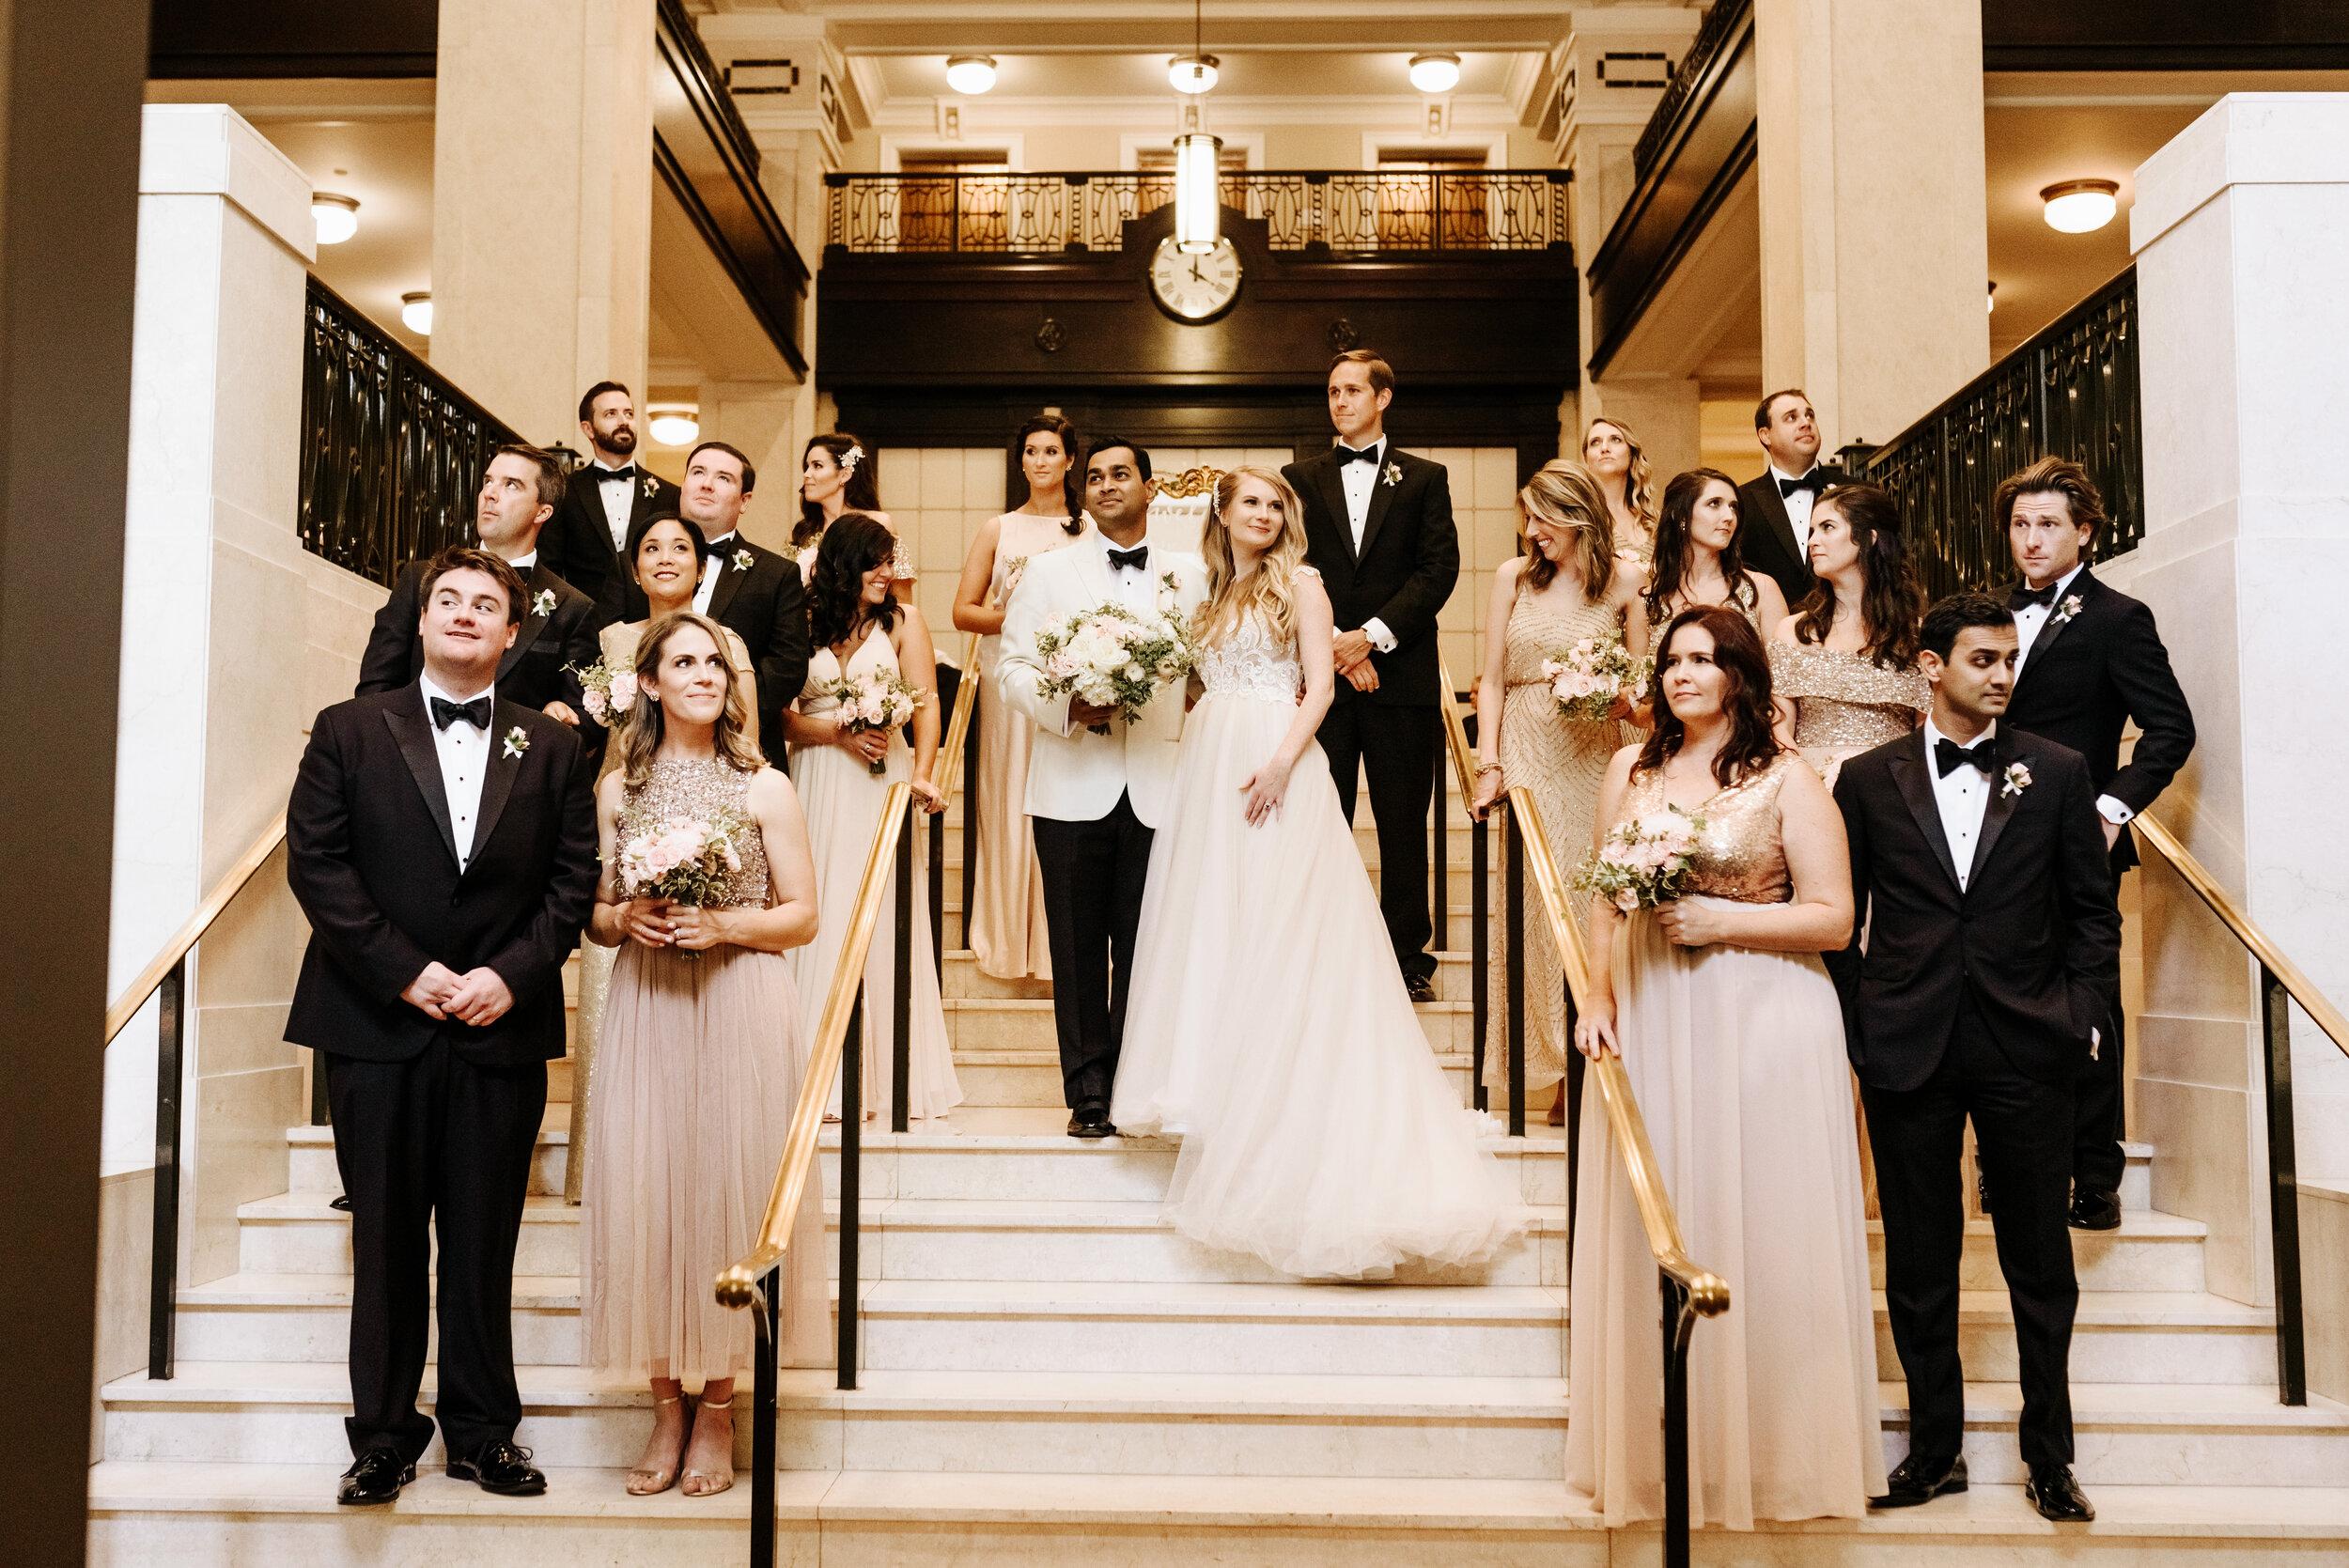 Cassie-Mrunal-Wedding-Quirk-Hotel-John-Marshall-Ballrooms-Richmond-Virginia-Photography-by-V-58.jpg